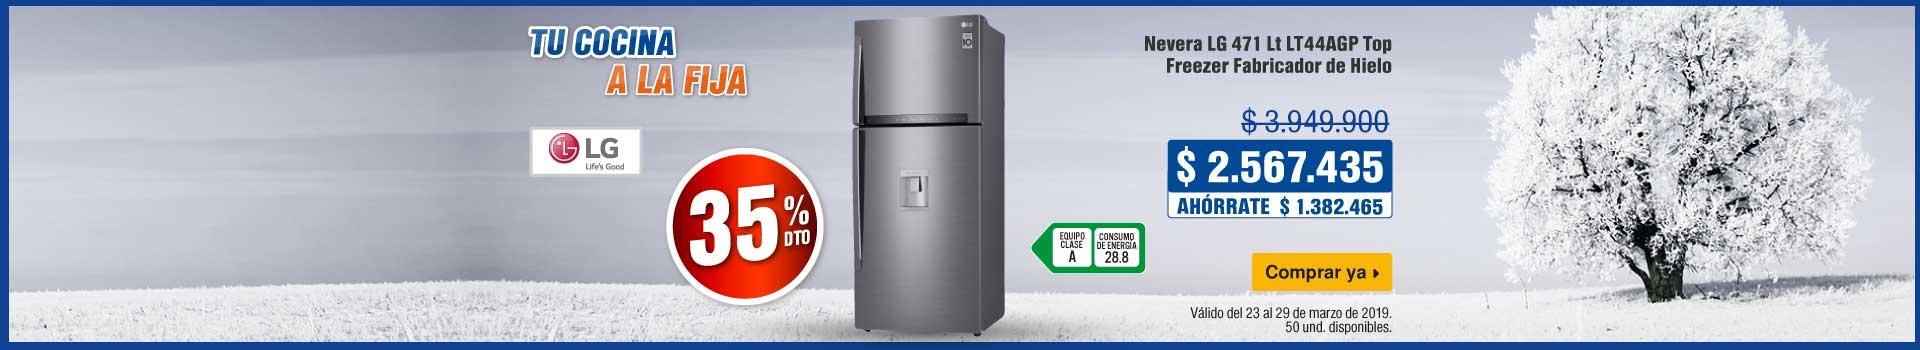 AK-KT-mayores-2-ELECT-BCAT-refrigeracion-LG-230319-extra